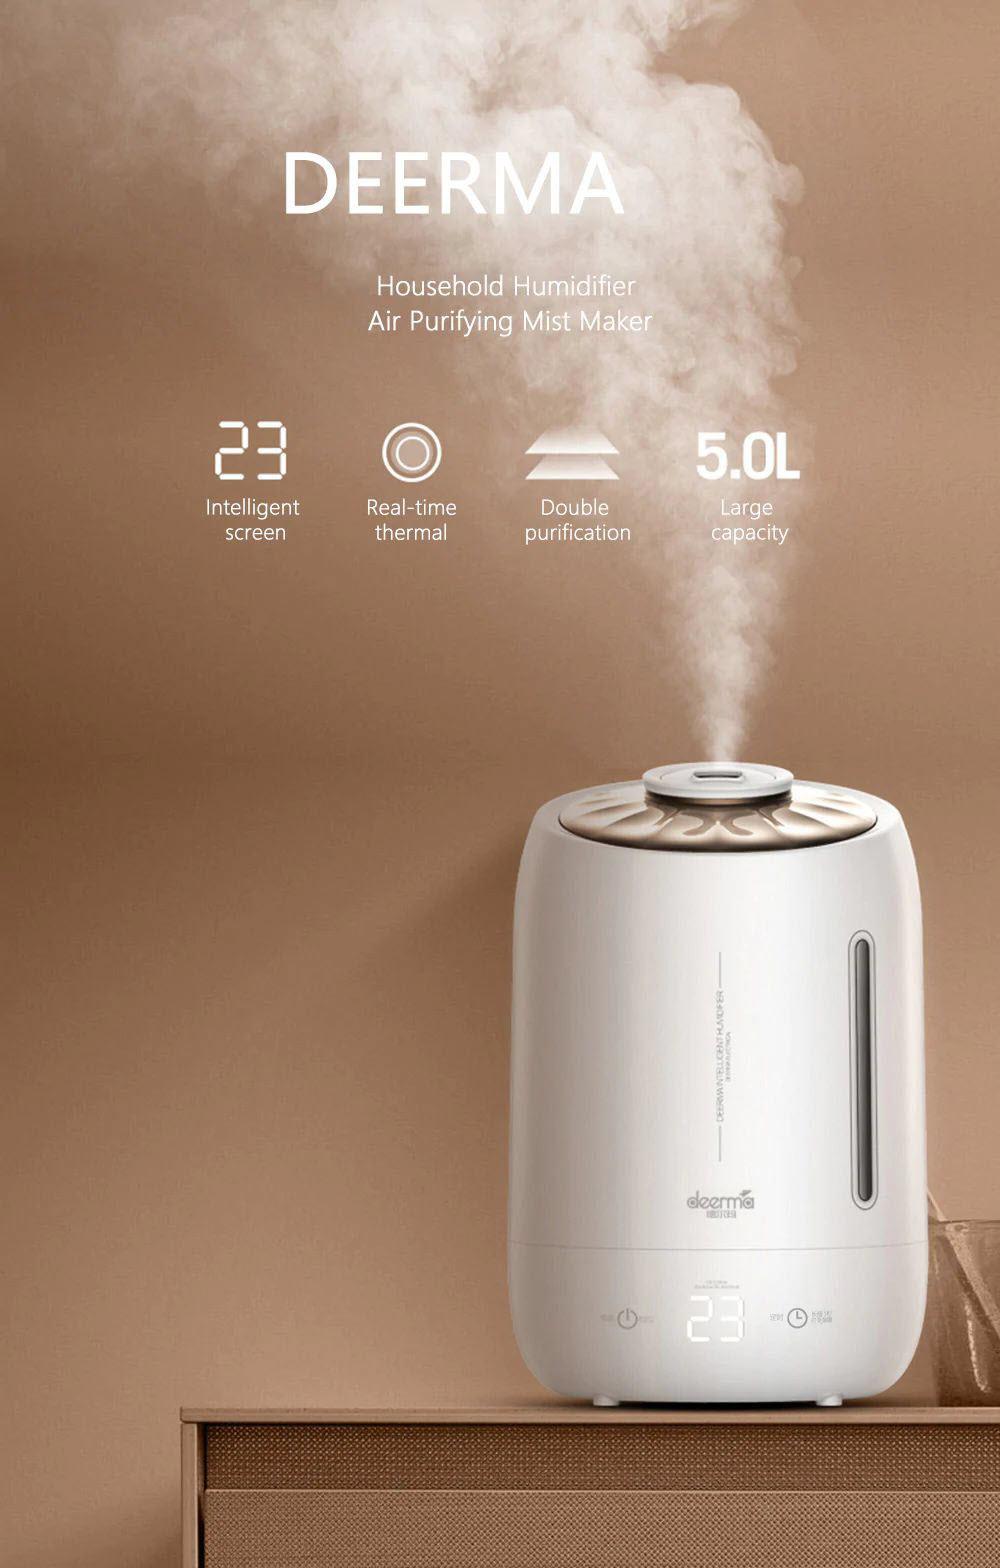 Xiaomi Deerma Dem F600 Household Humidifier Purifying Mist Maker 5l (2)